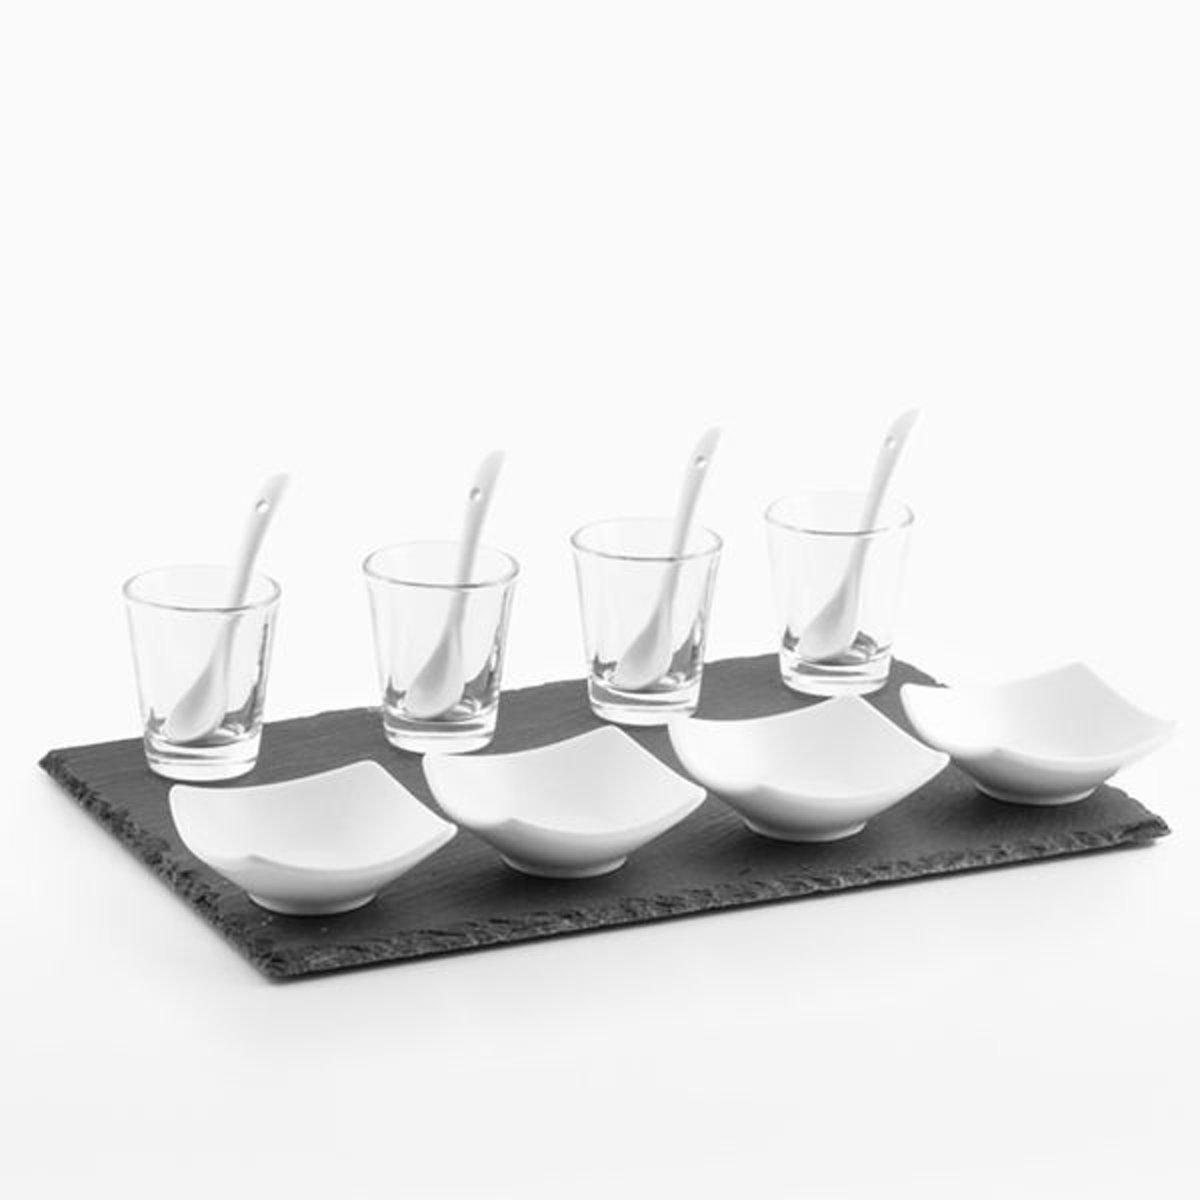 Atopoir Noir Amuse Set (13 stuks)